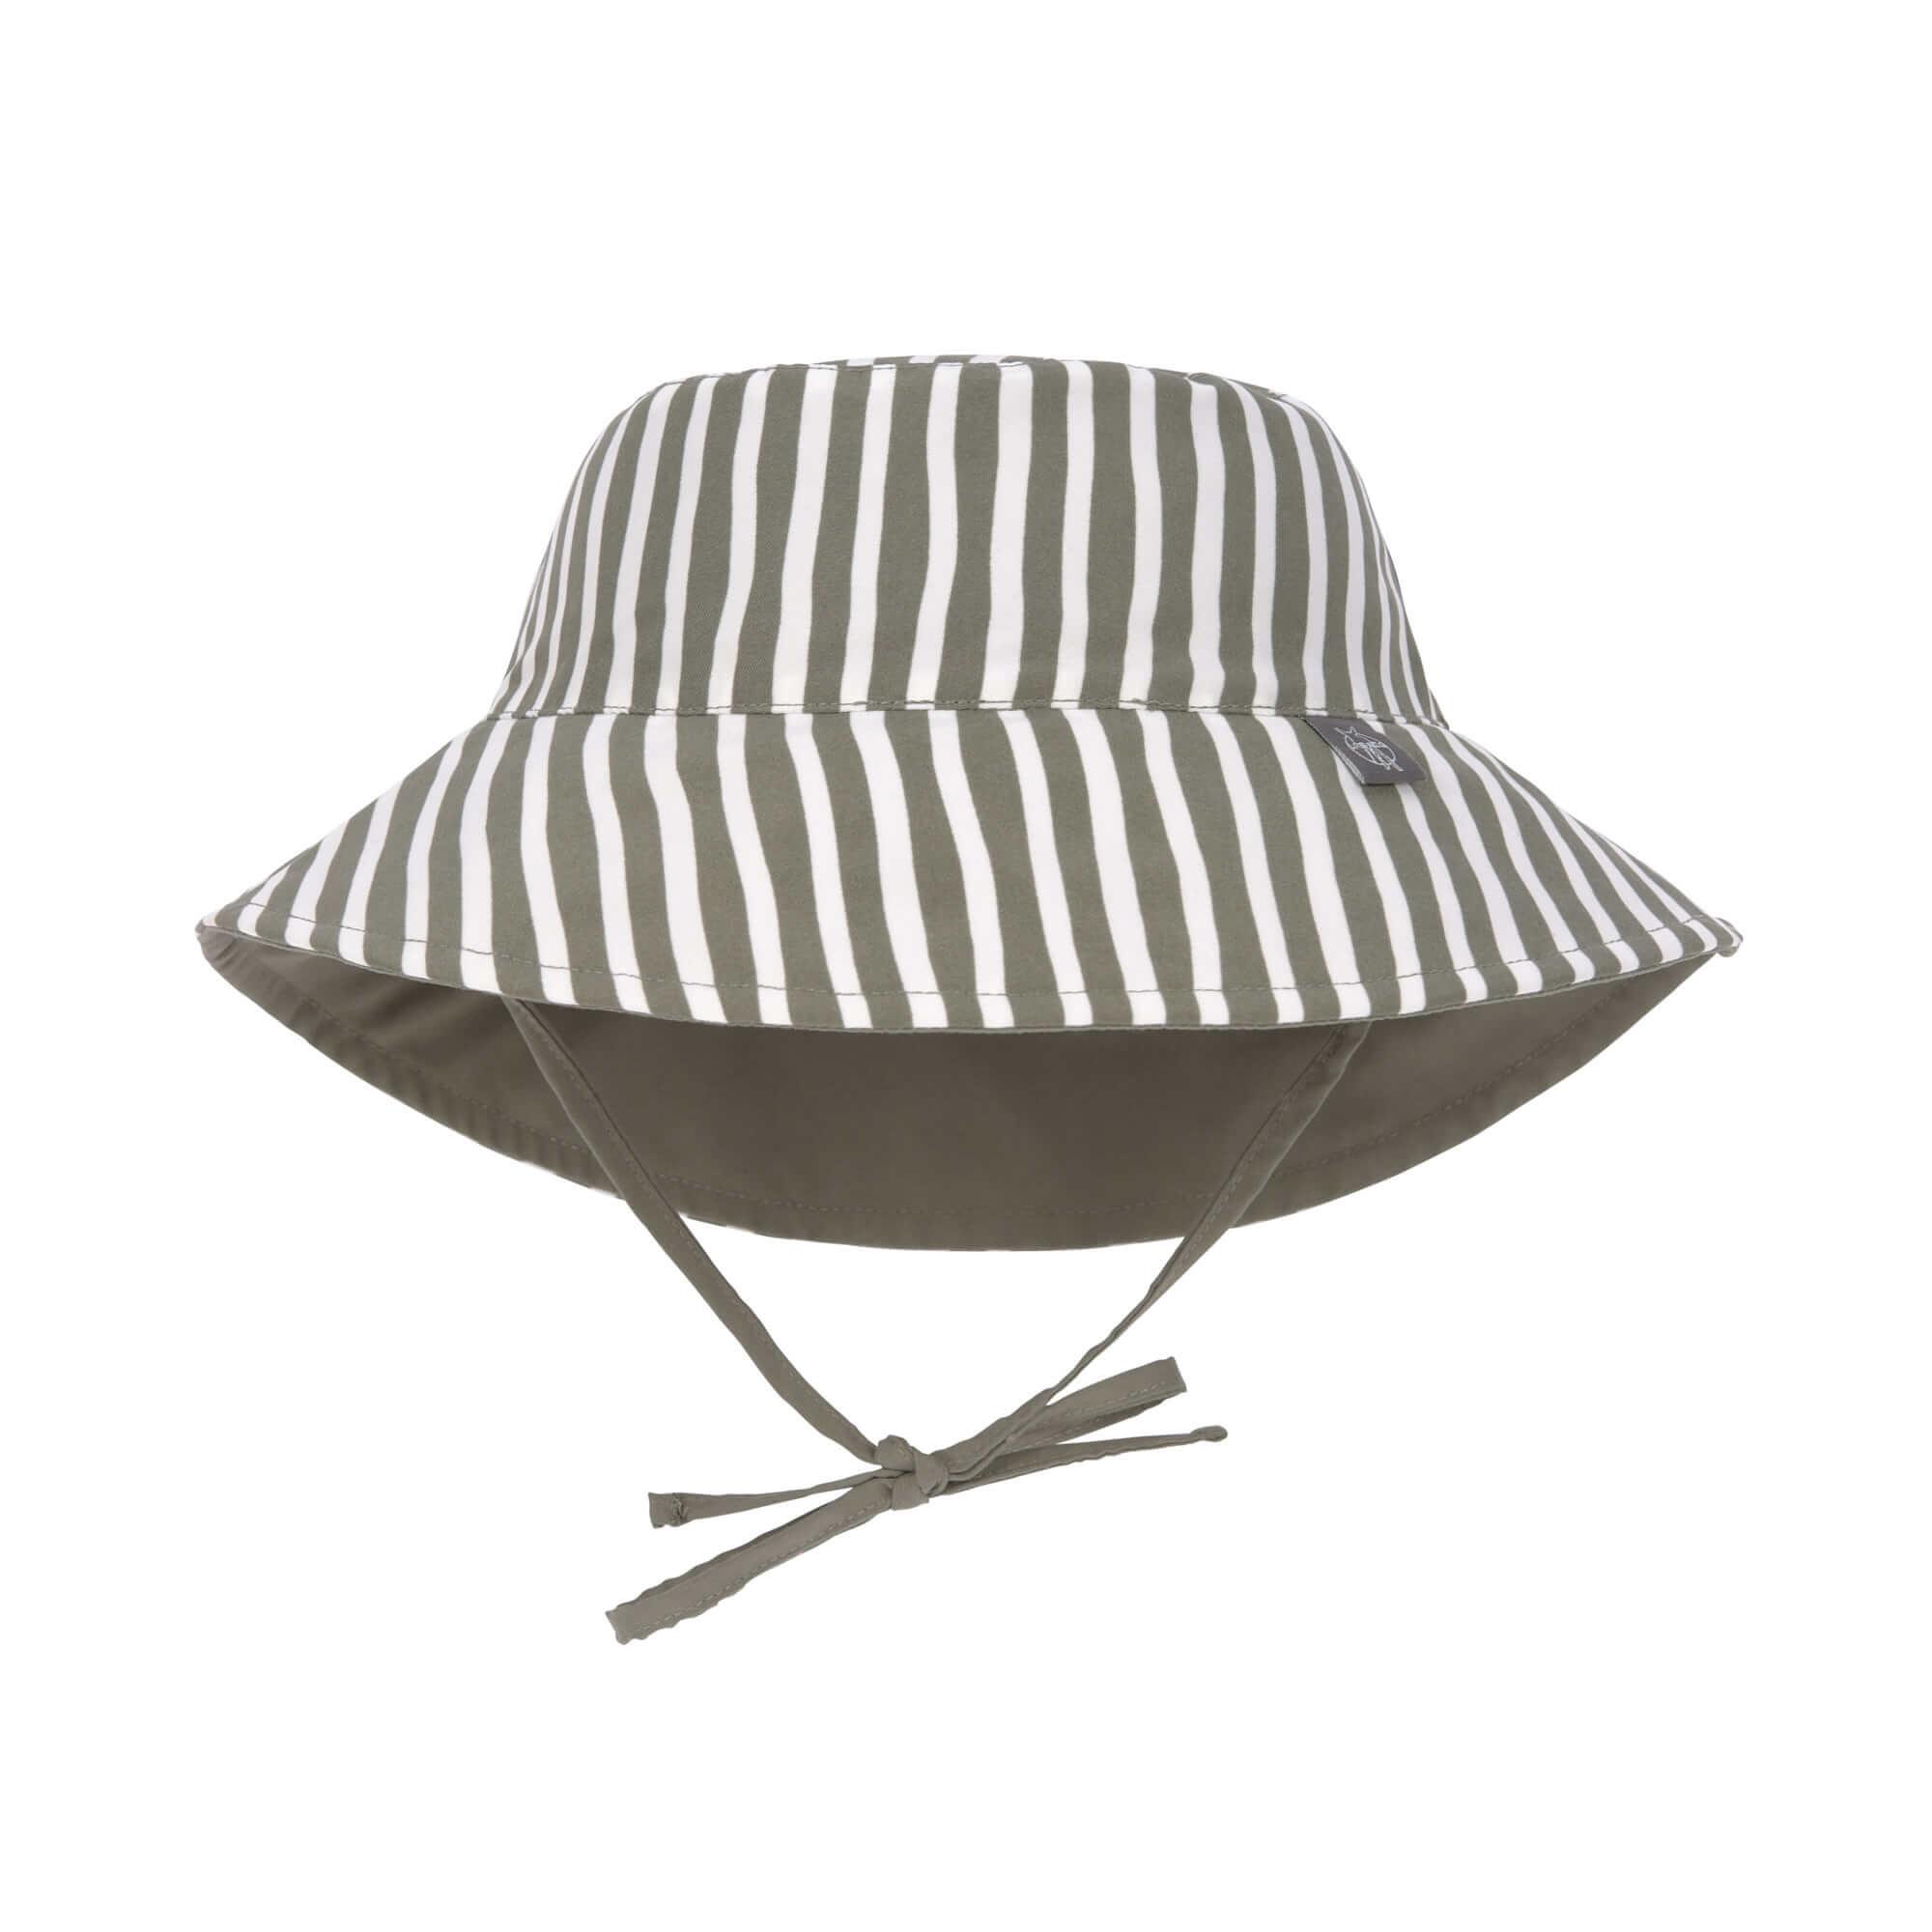 Lässig Lässig Splash & Fun Sun Protection Zonnehoed Vissershoed met UV bescherming - Stripes olive 19-36 maanden, Maat: 50/51